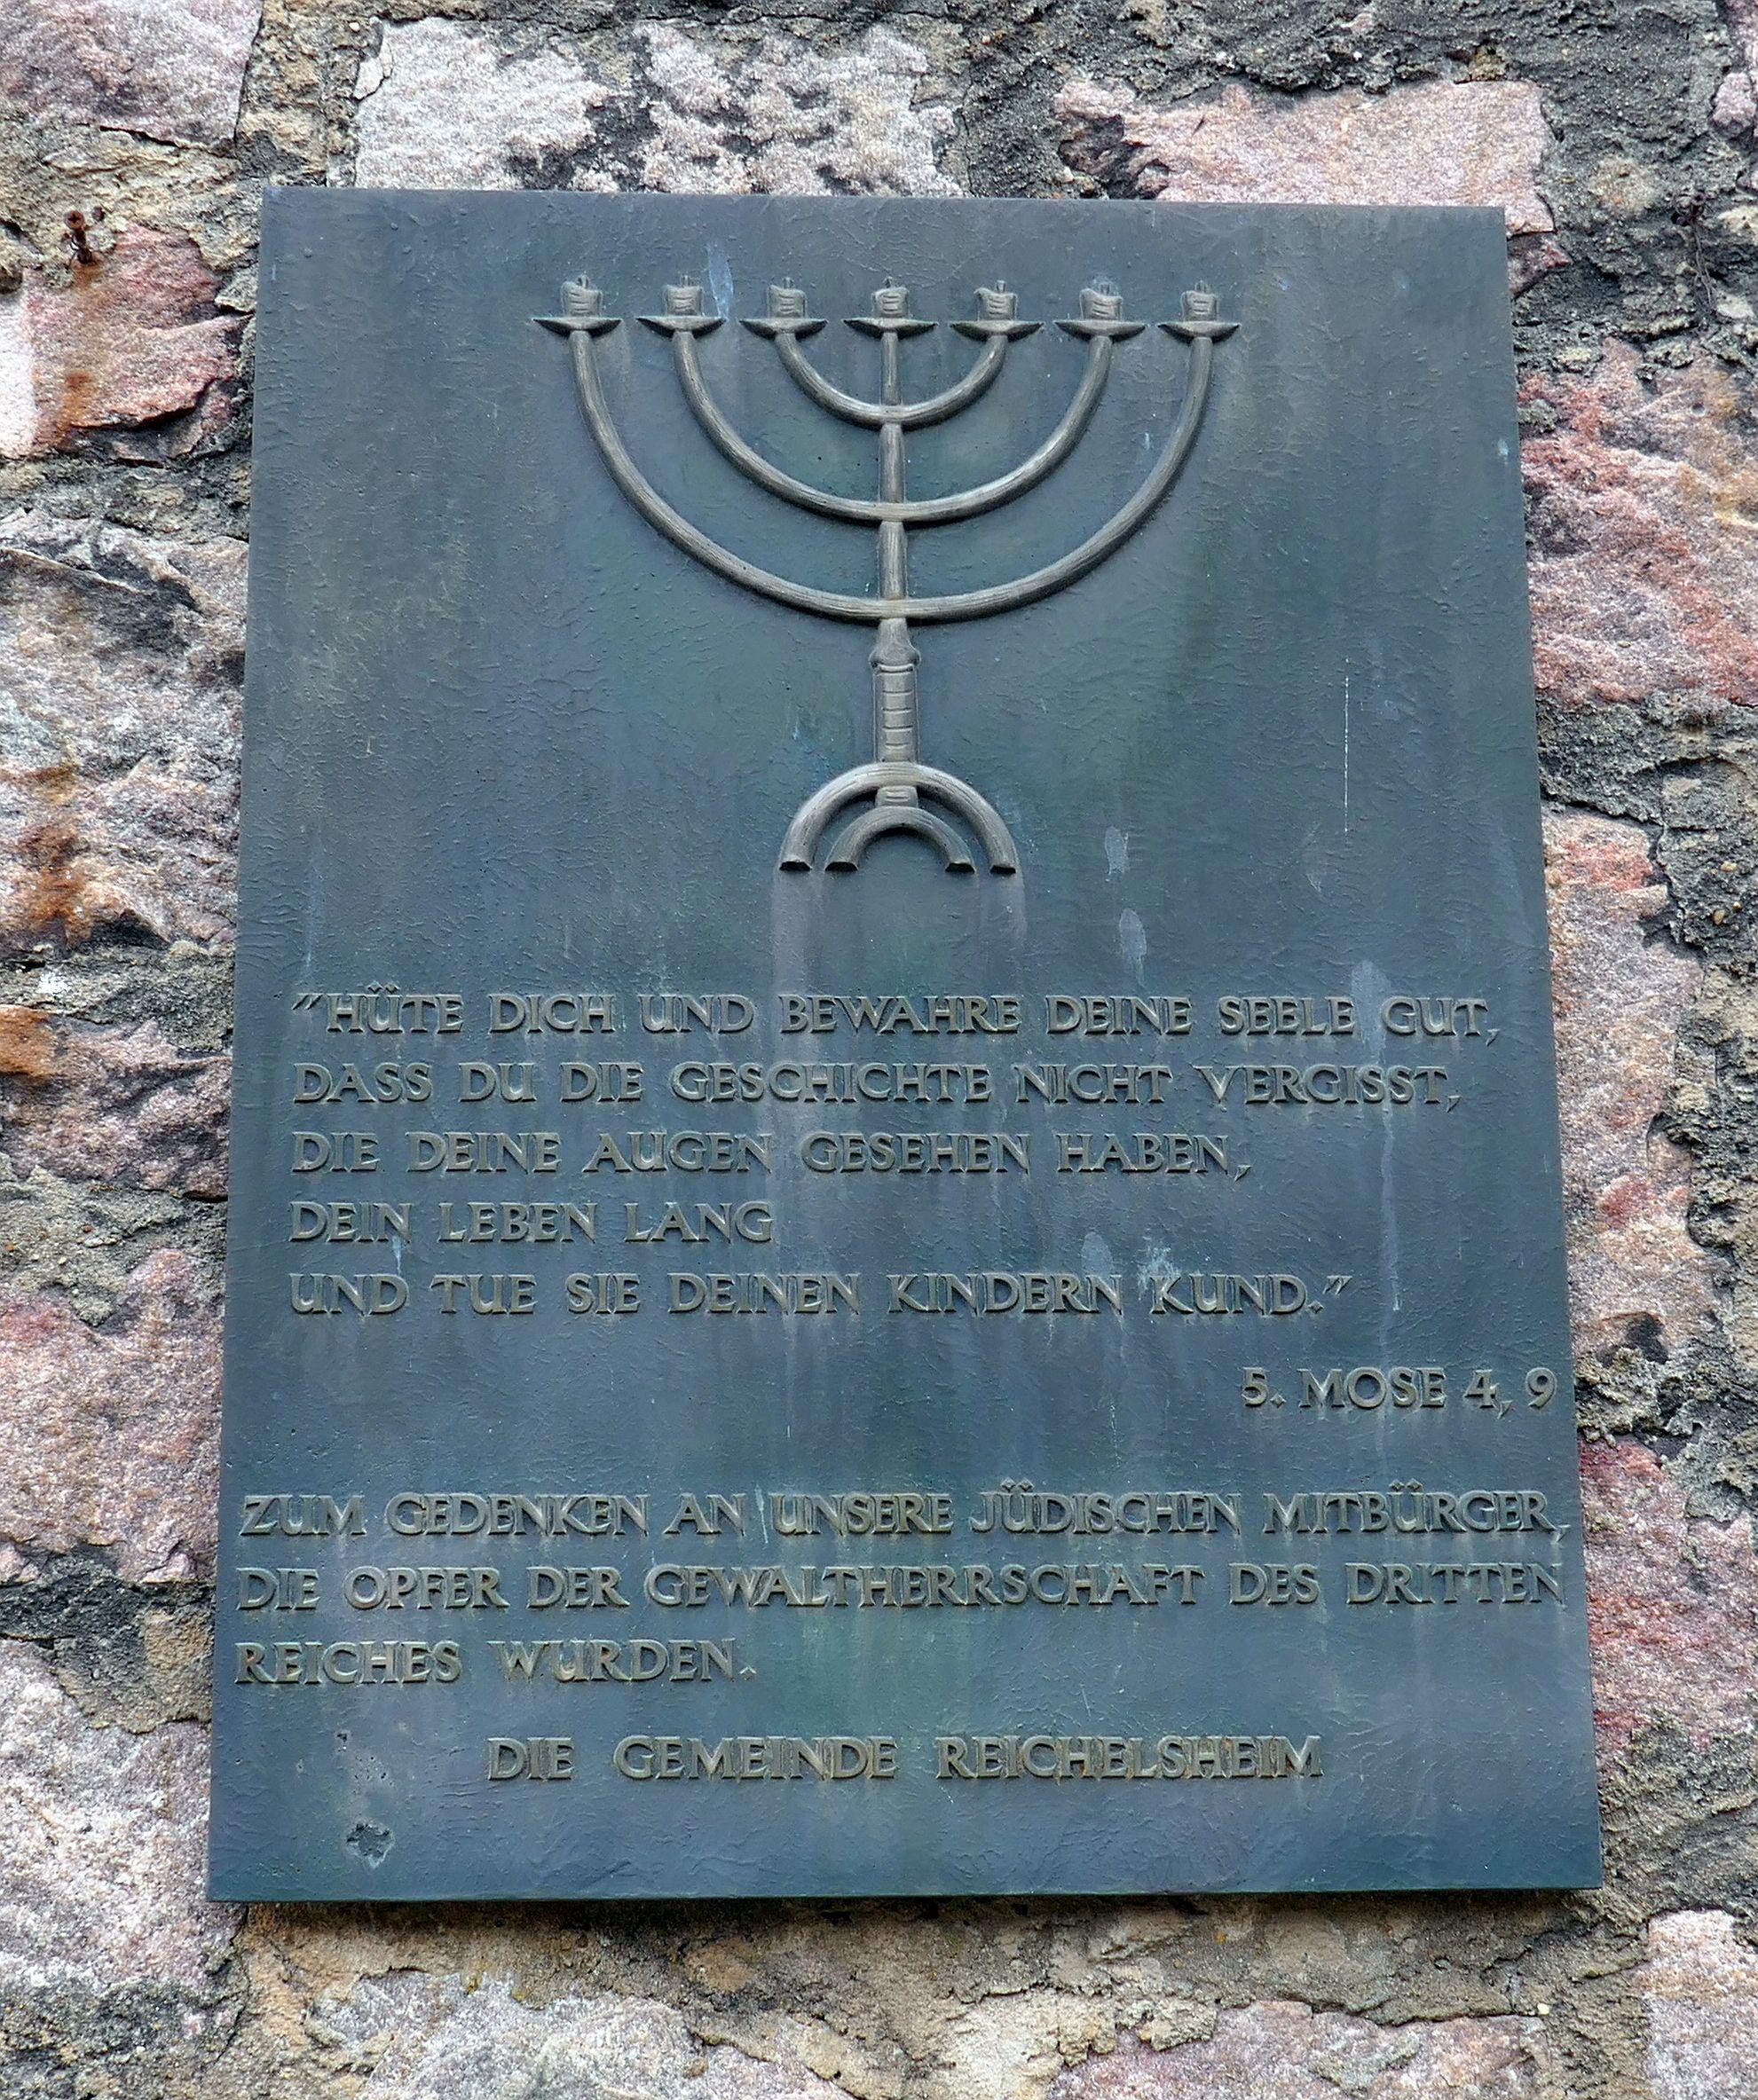 https://www.alemannia-judaica.de/images/Images%20446/Reichelsheim%20Gedenken%20P1040834.jpg